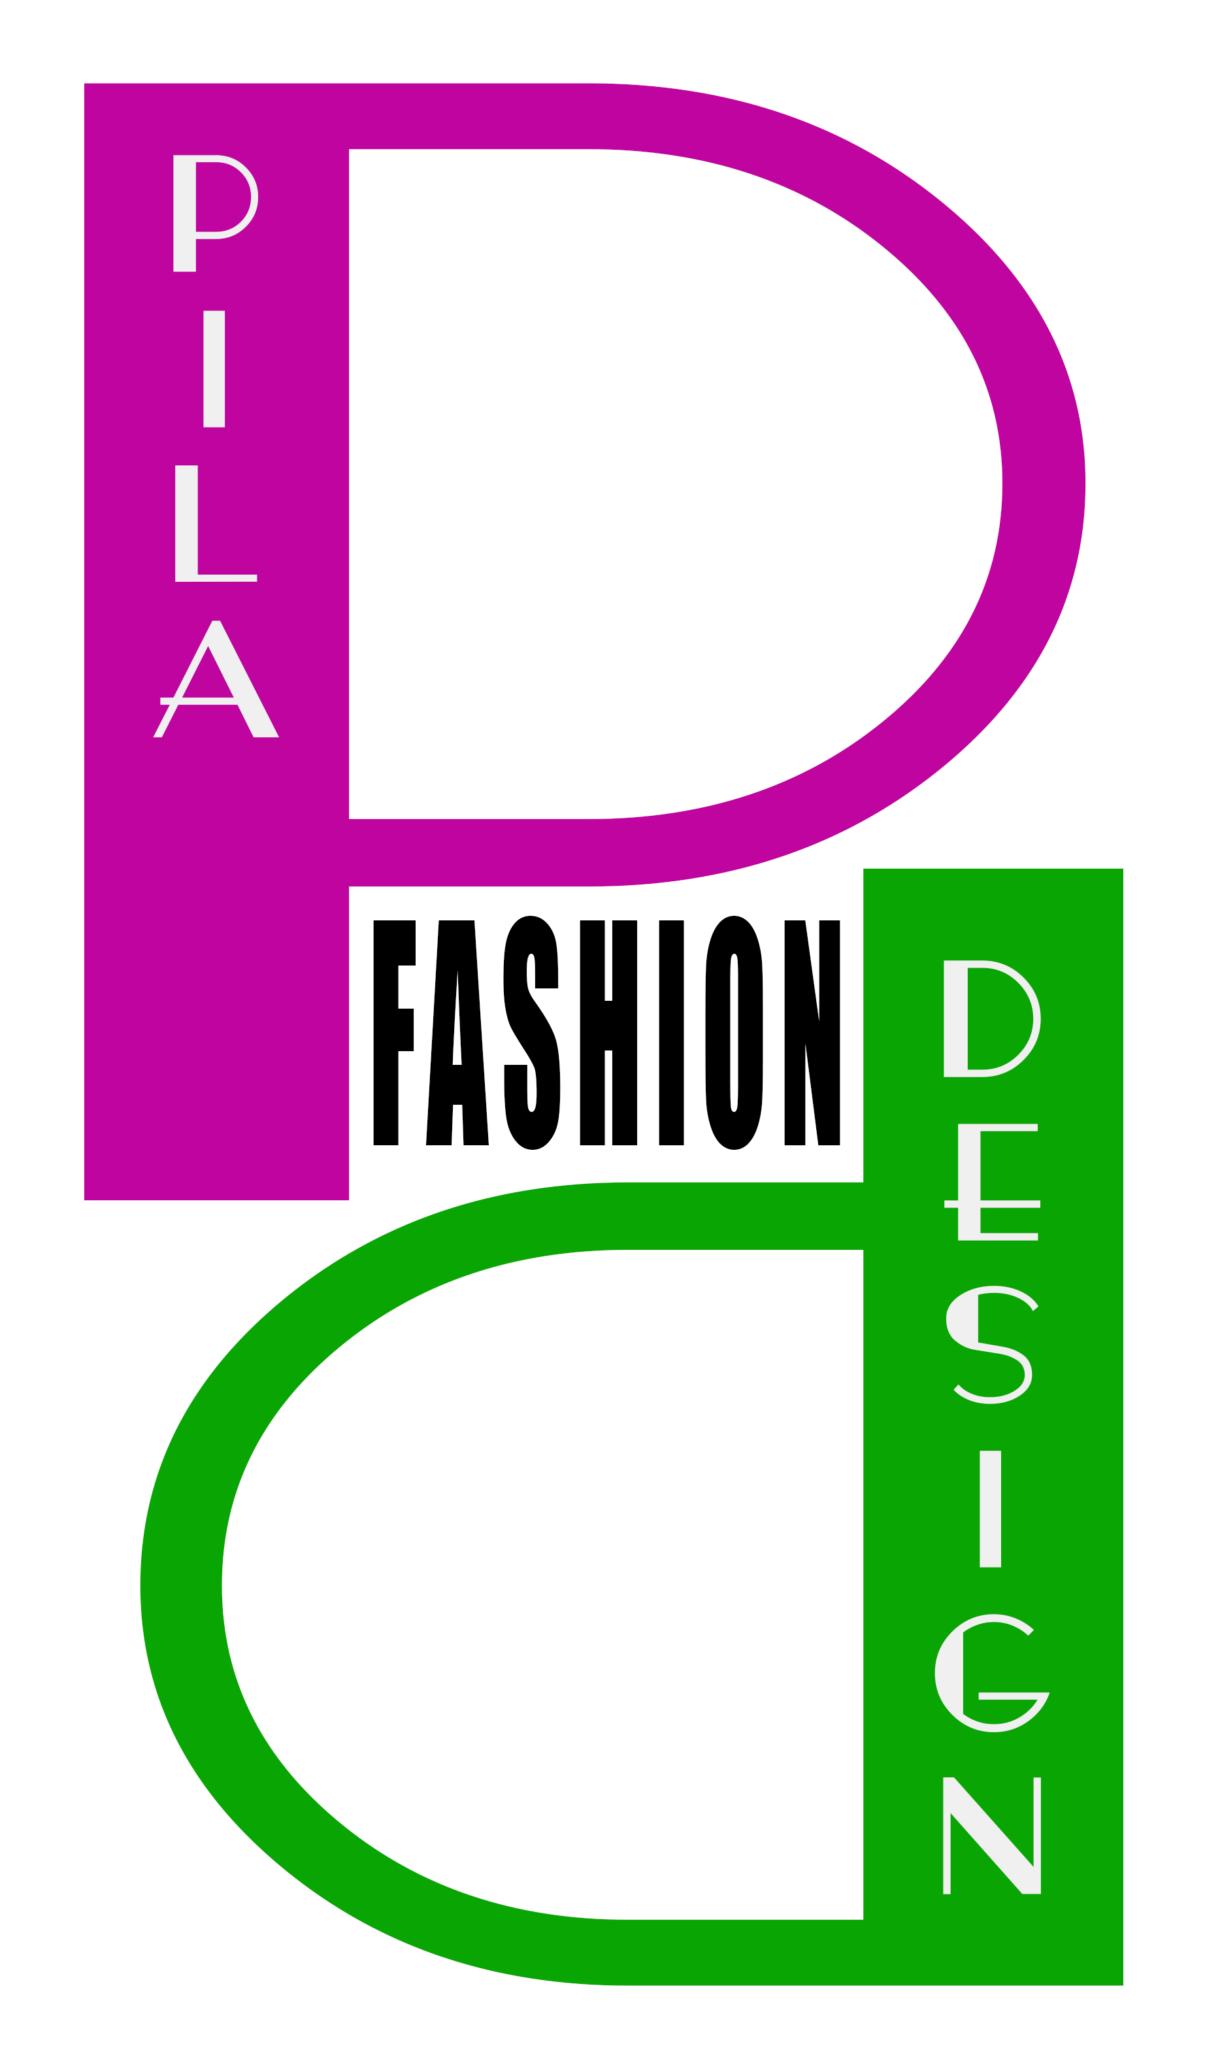 Pila Fashion Design